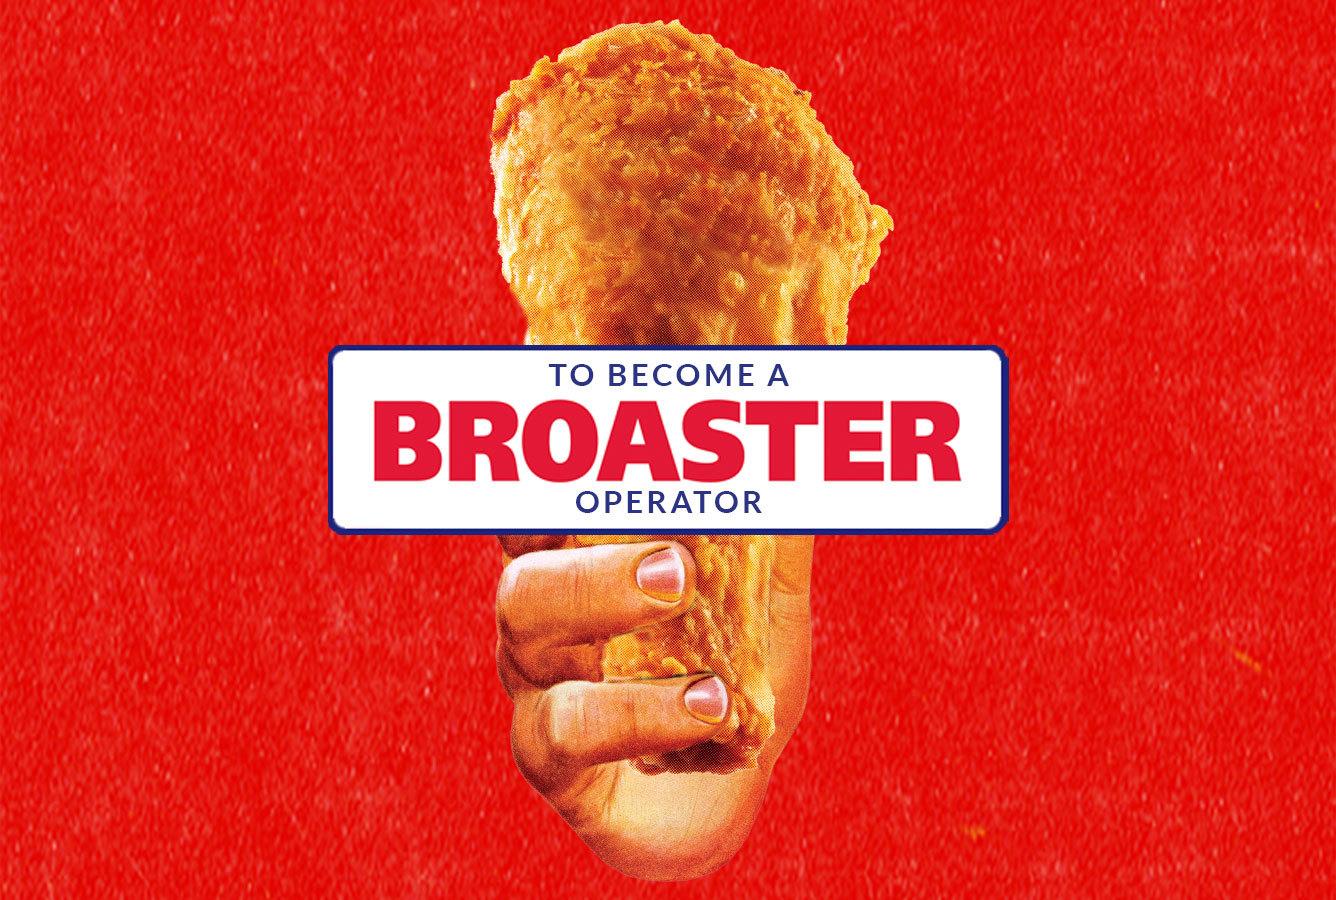 Become a Broaster operator